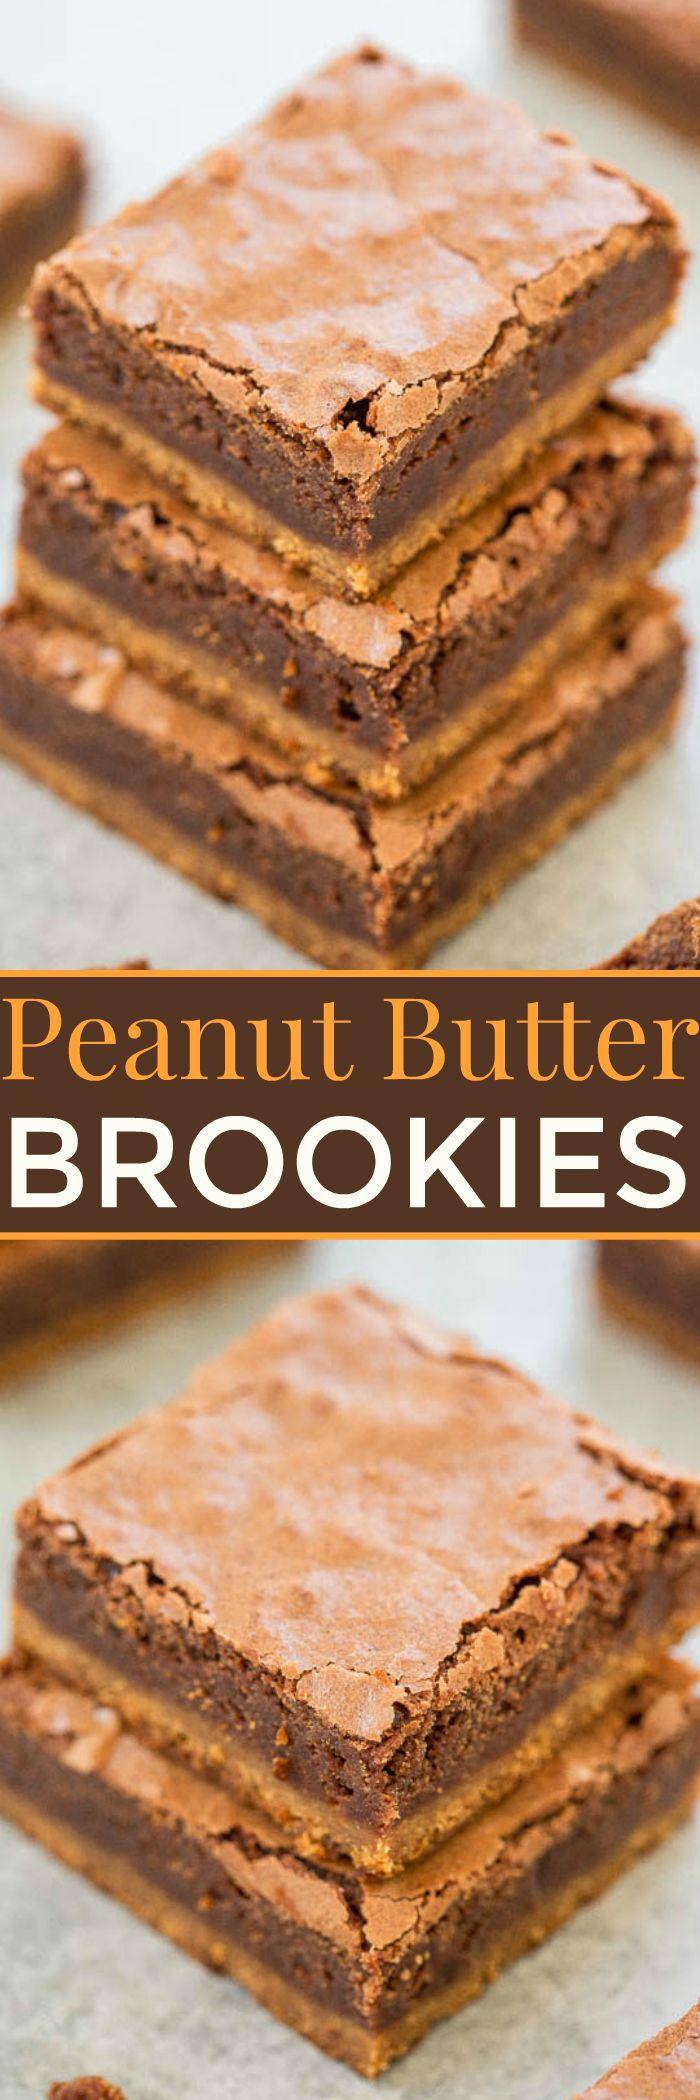 Peanut Butter Brookies